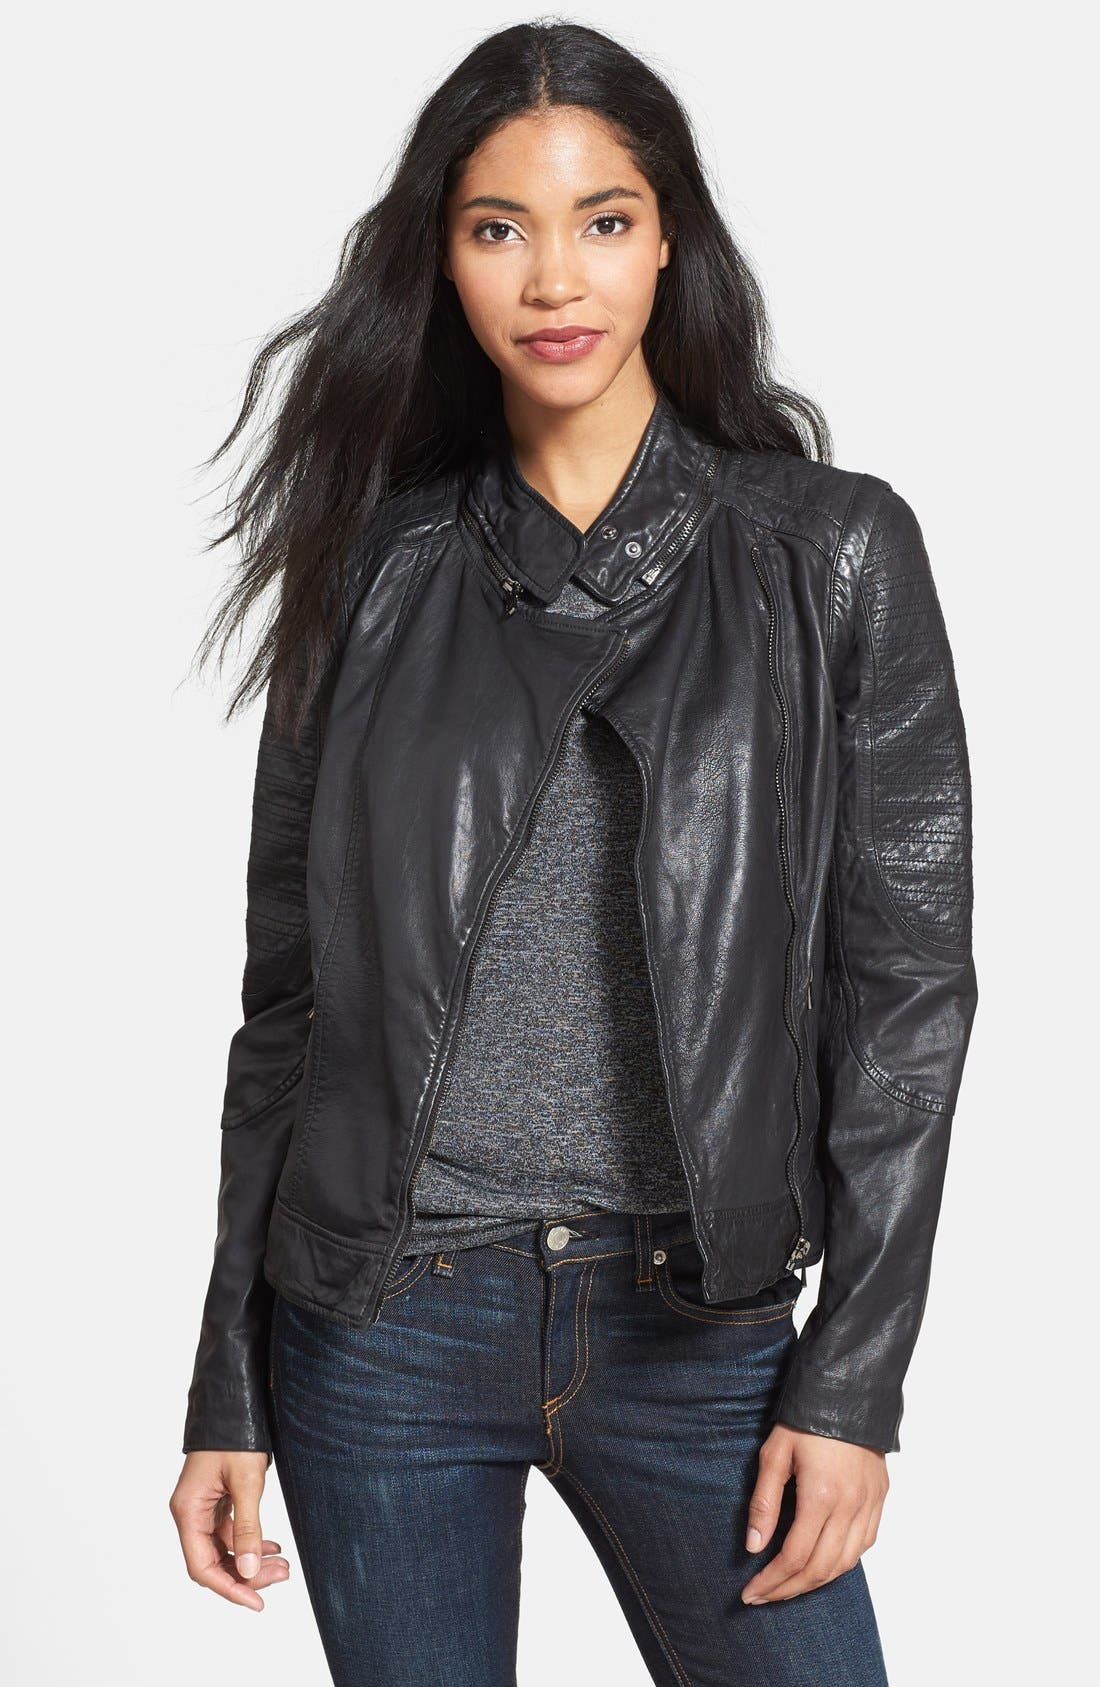 Main Image - Bod & Christensen Zip-Off Sleeve Leather Biker Jacket